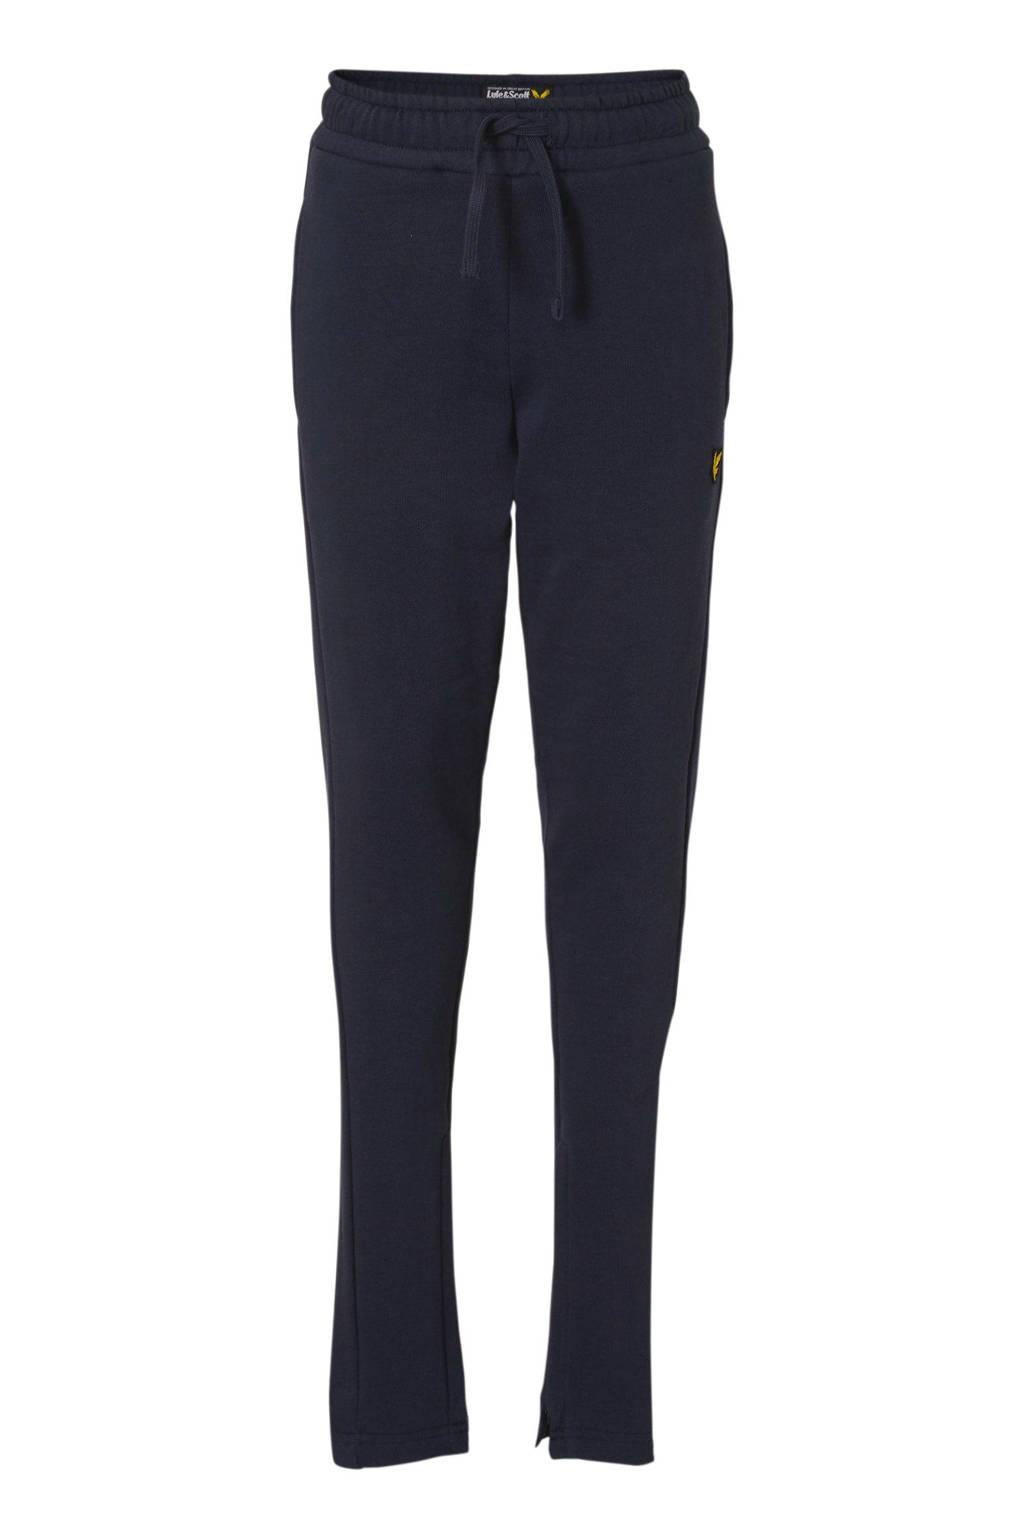 Lyle & Scott   skinny joggingbroek met logo donkerblauw, Donkerblauw